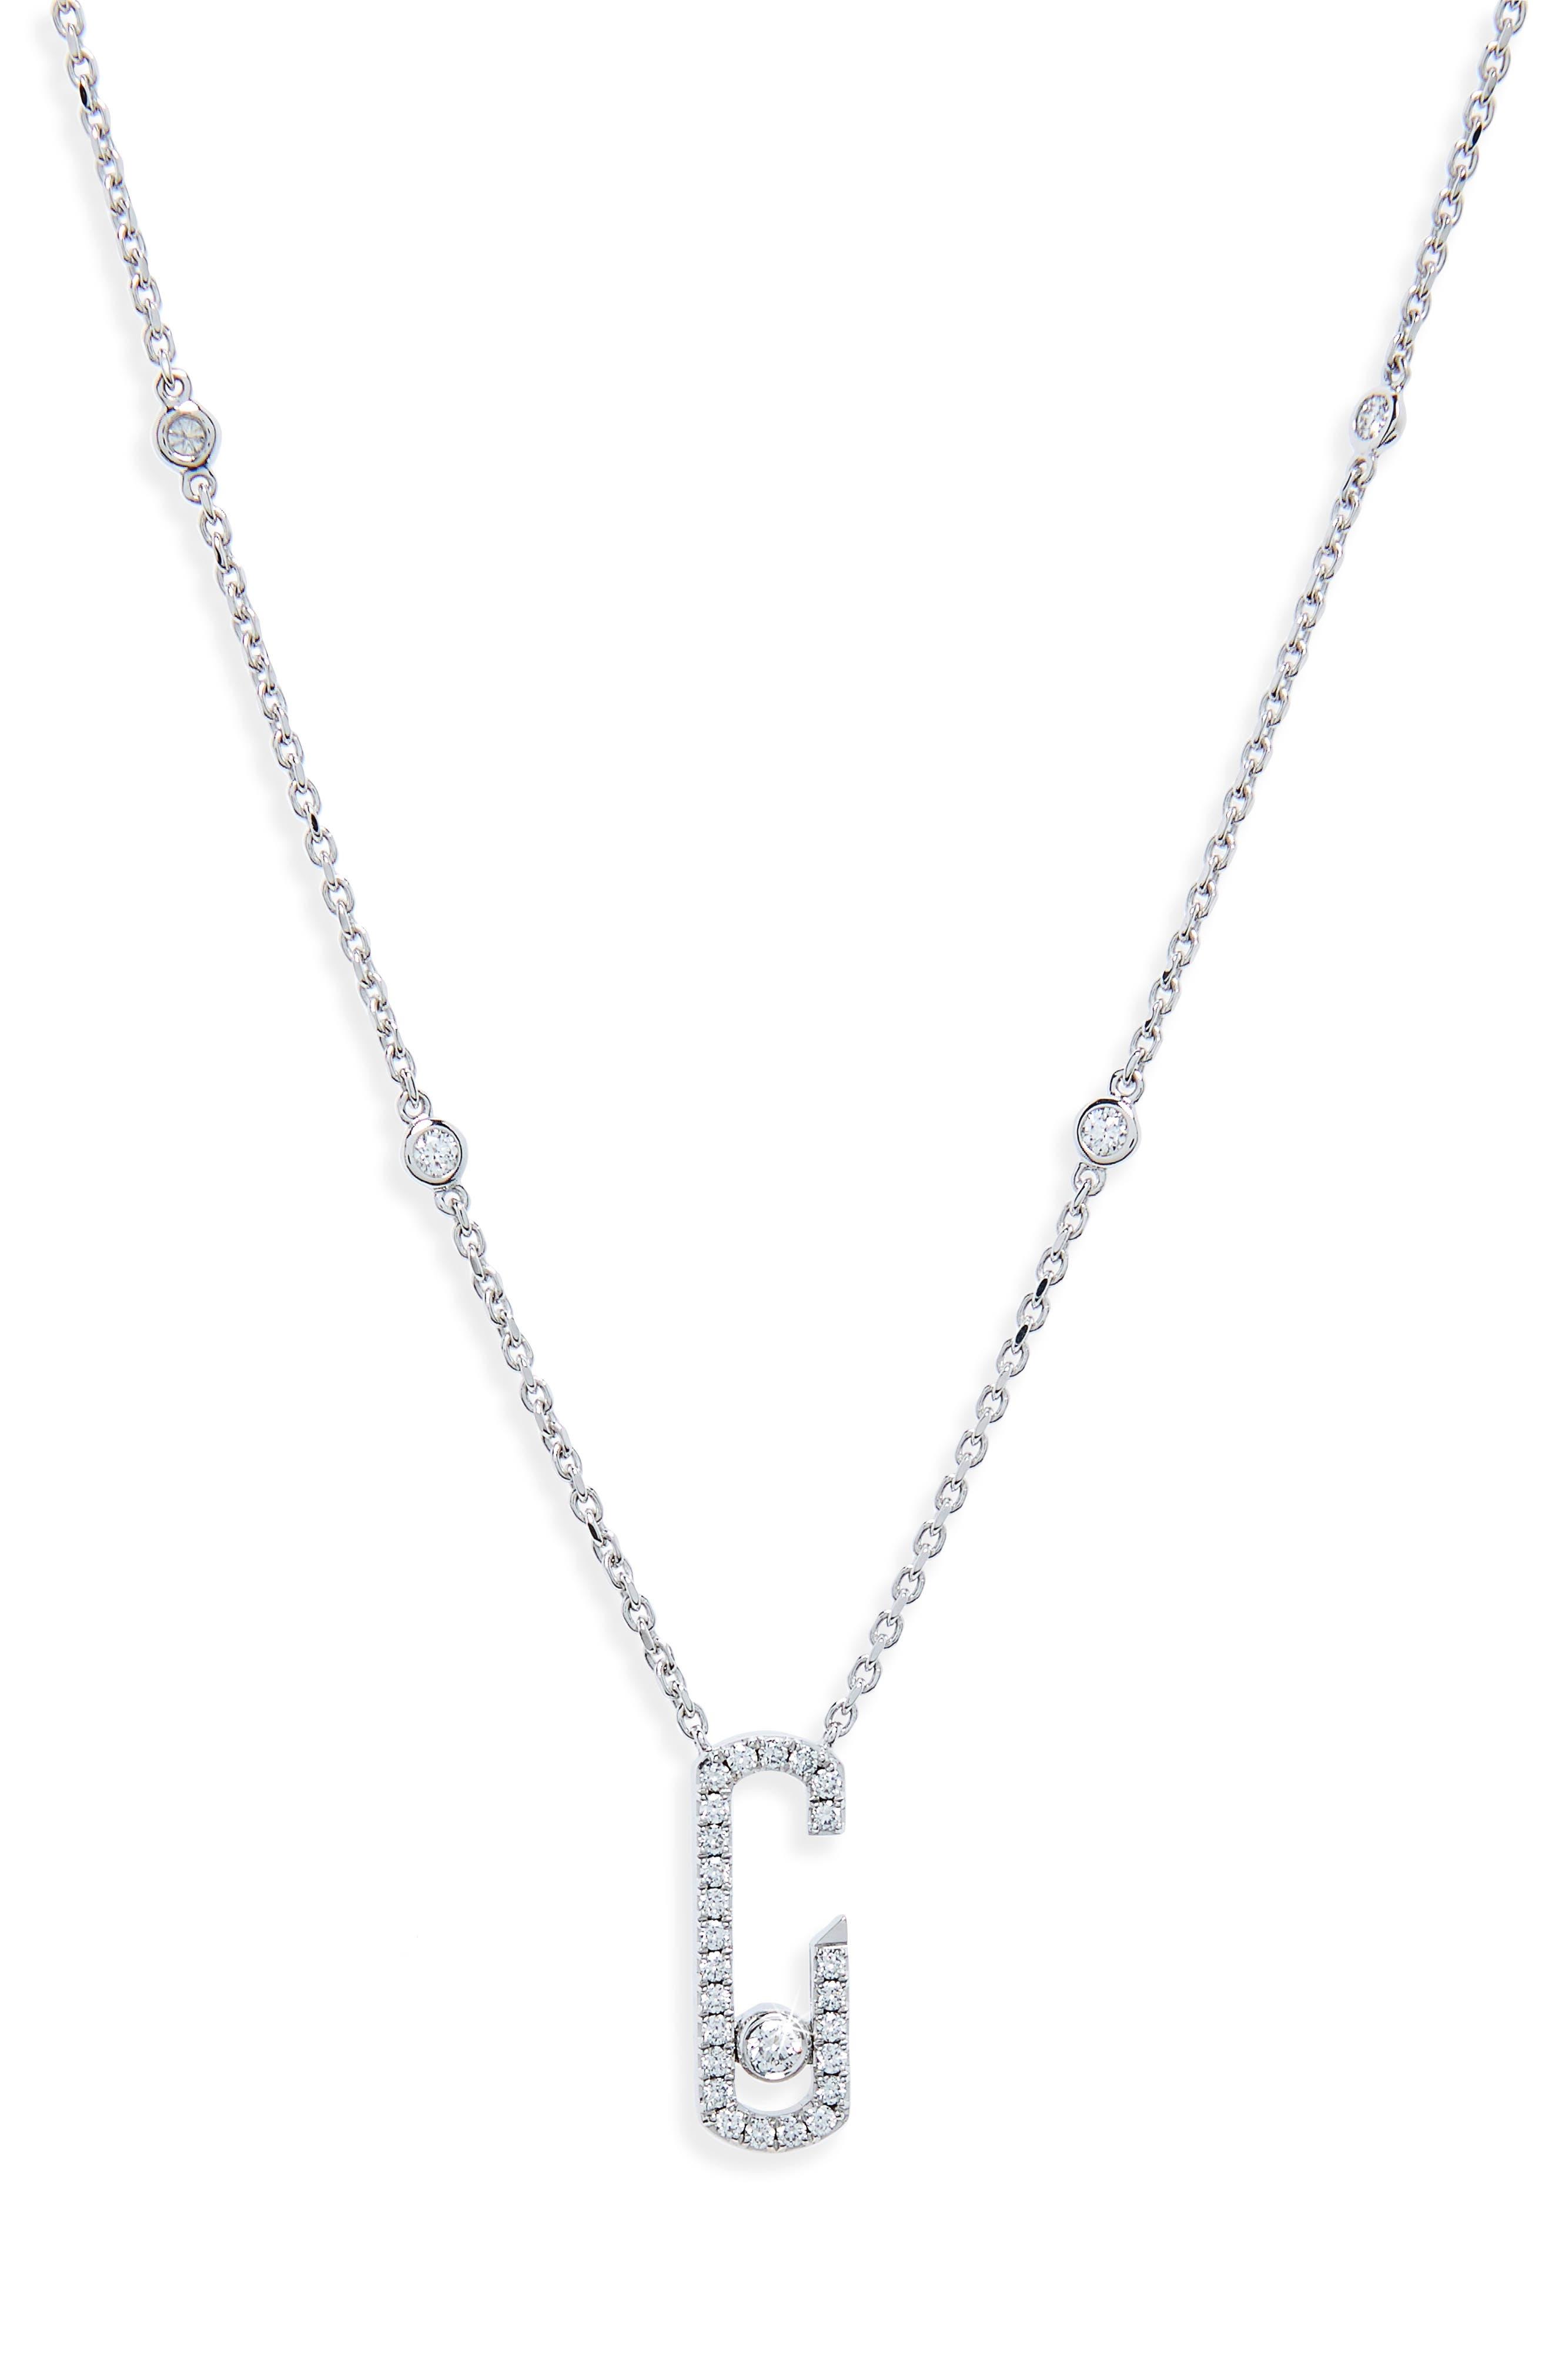 by Gigi Hadid Move Addiction 18K Gold & Diamond Pendant Necklace,                         Main,                         color, White Gold